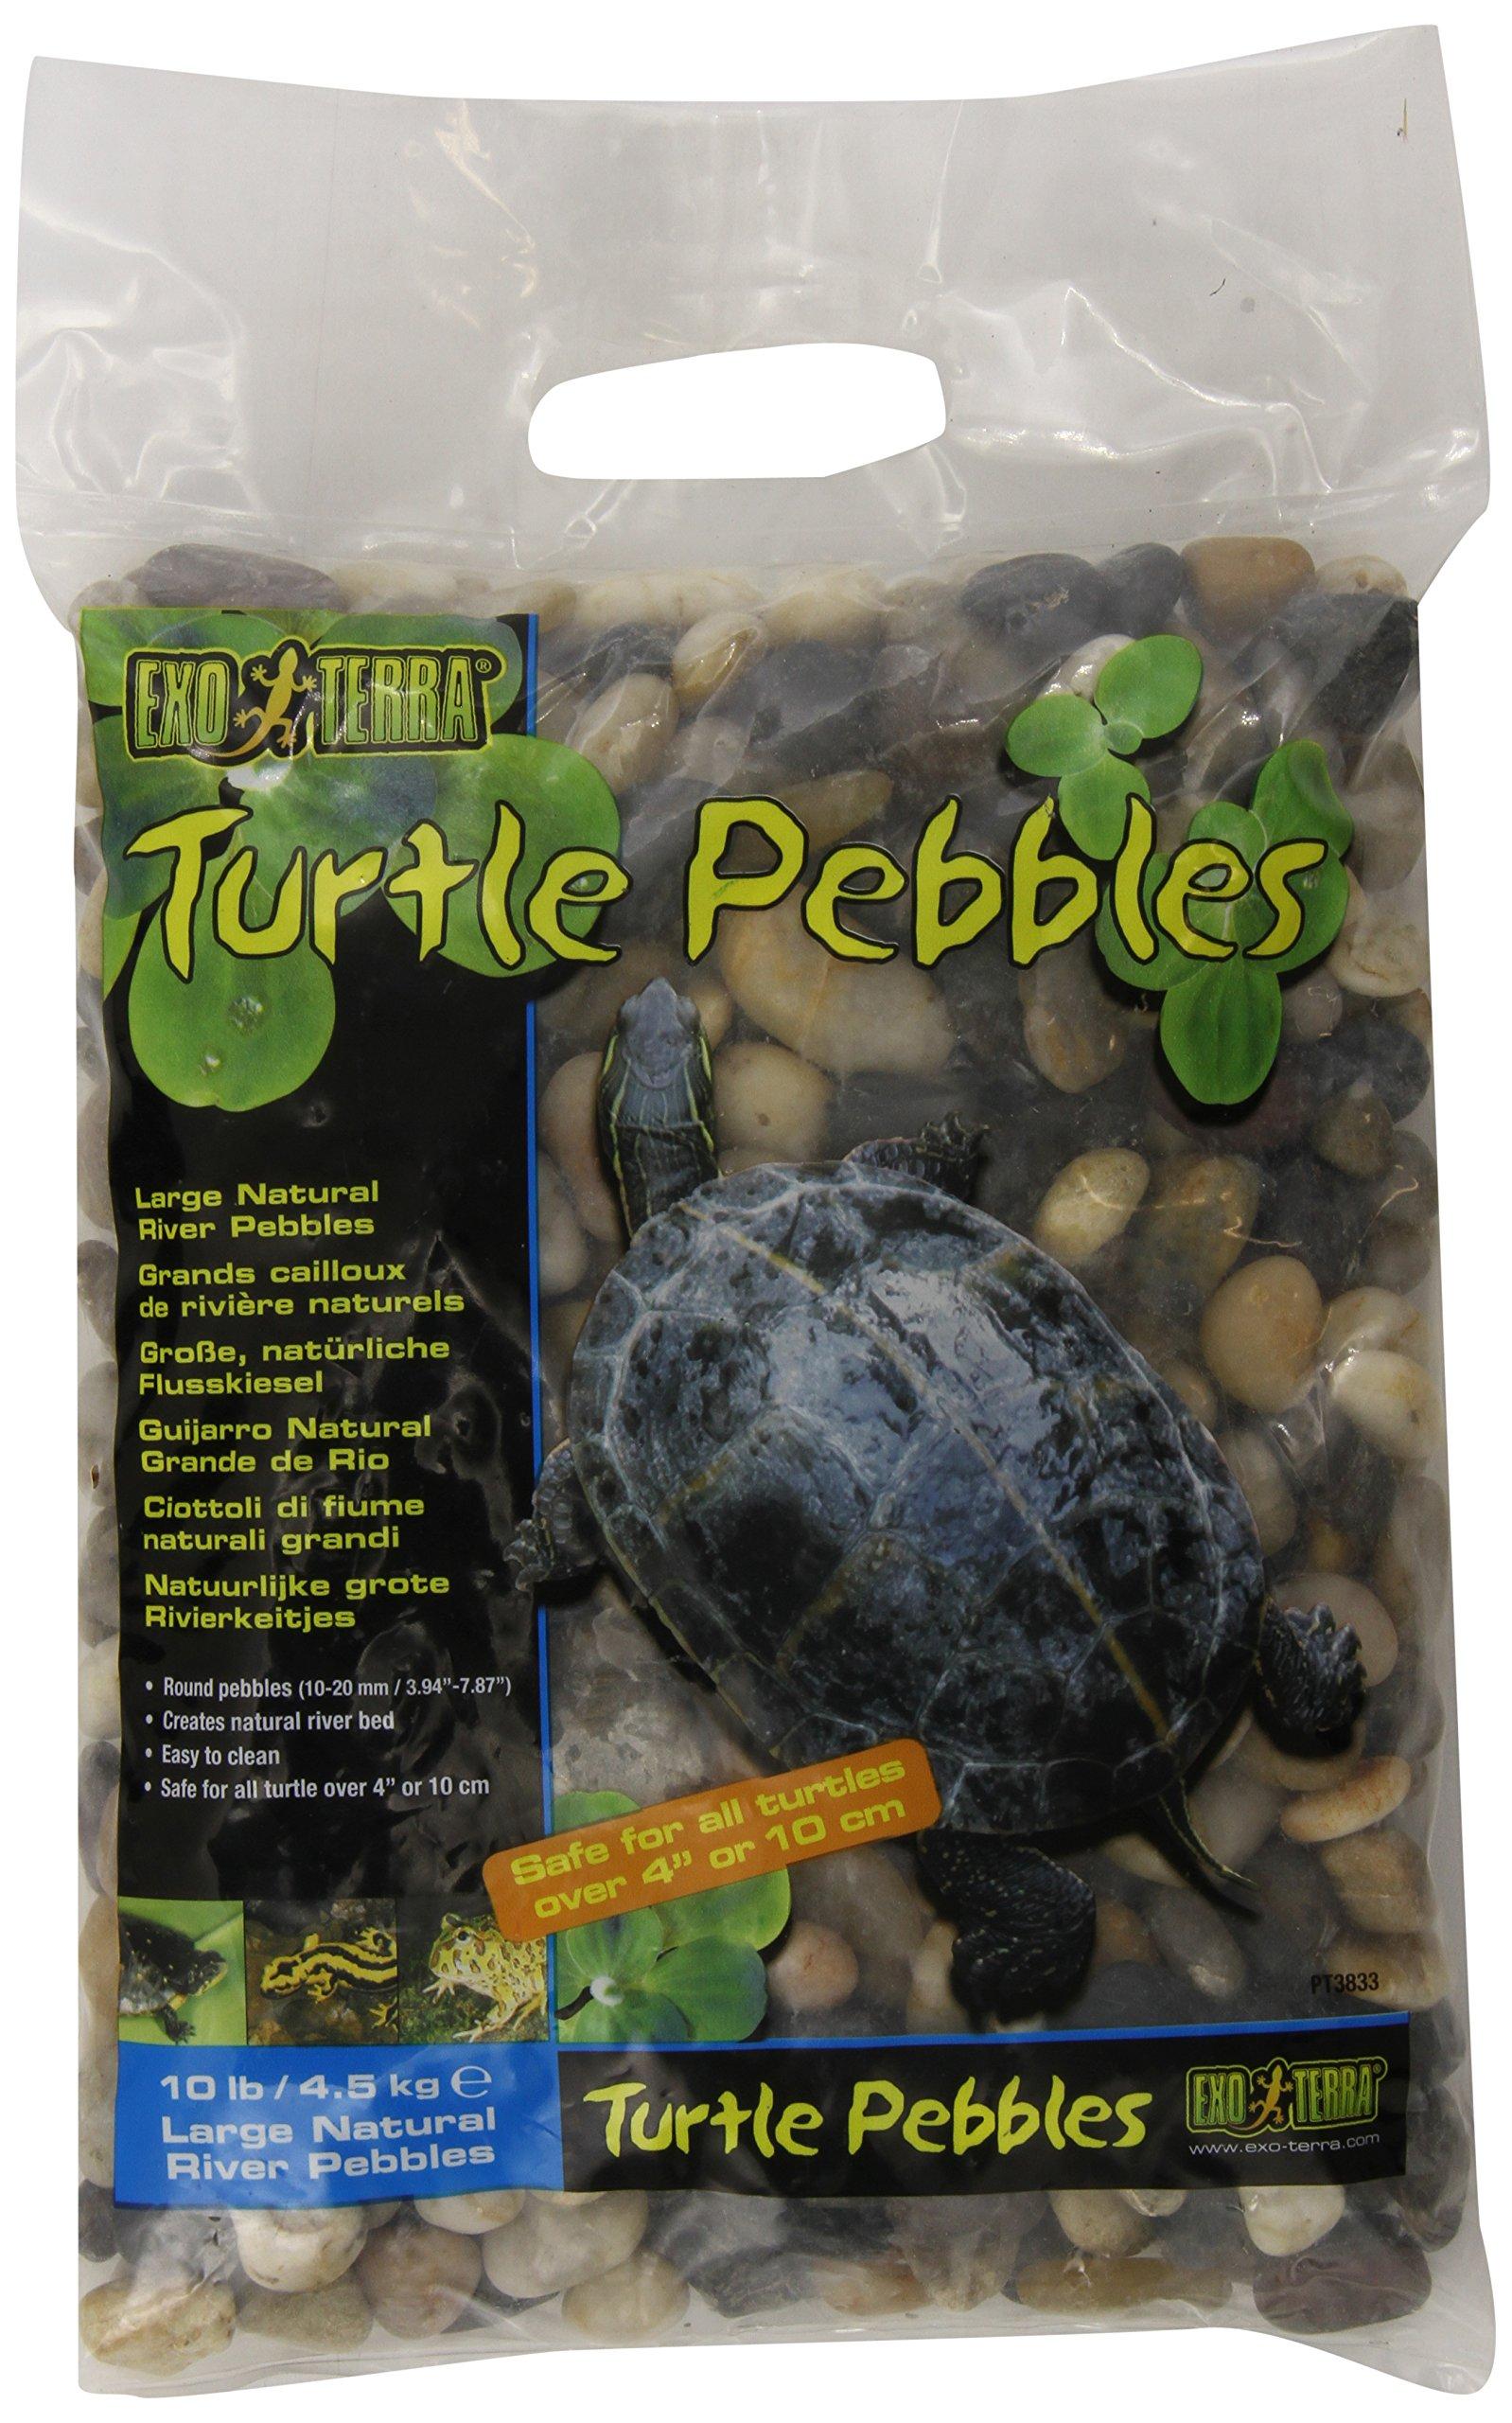 Exo Terra Turtle Pebbles, Large